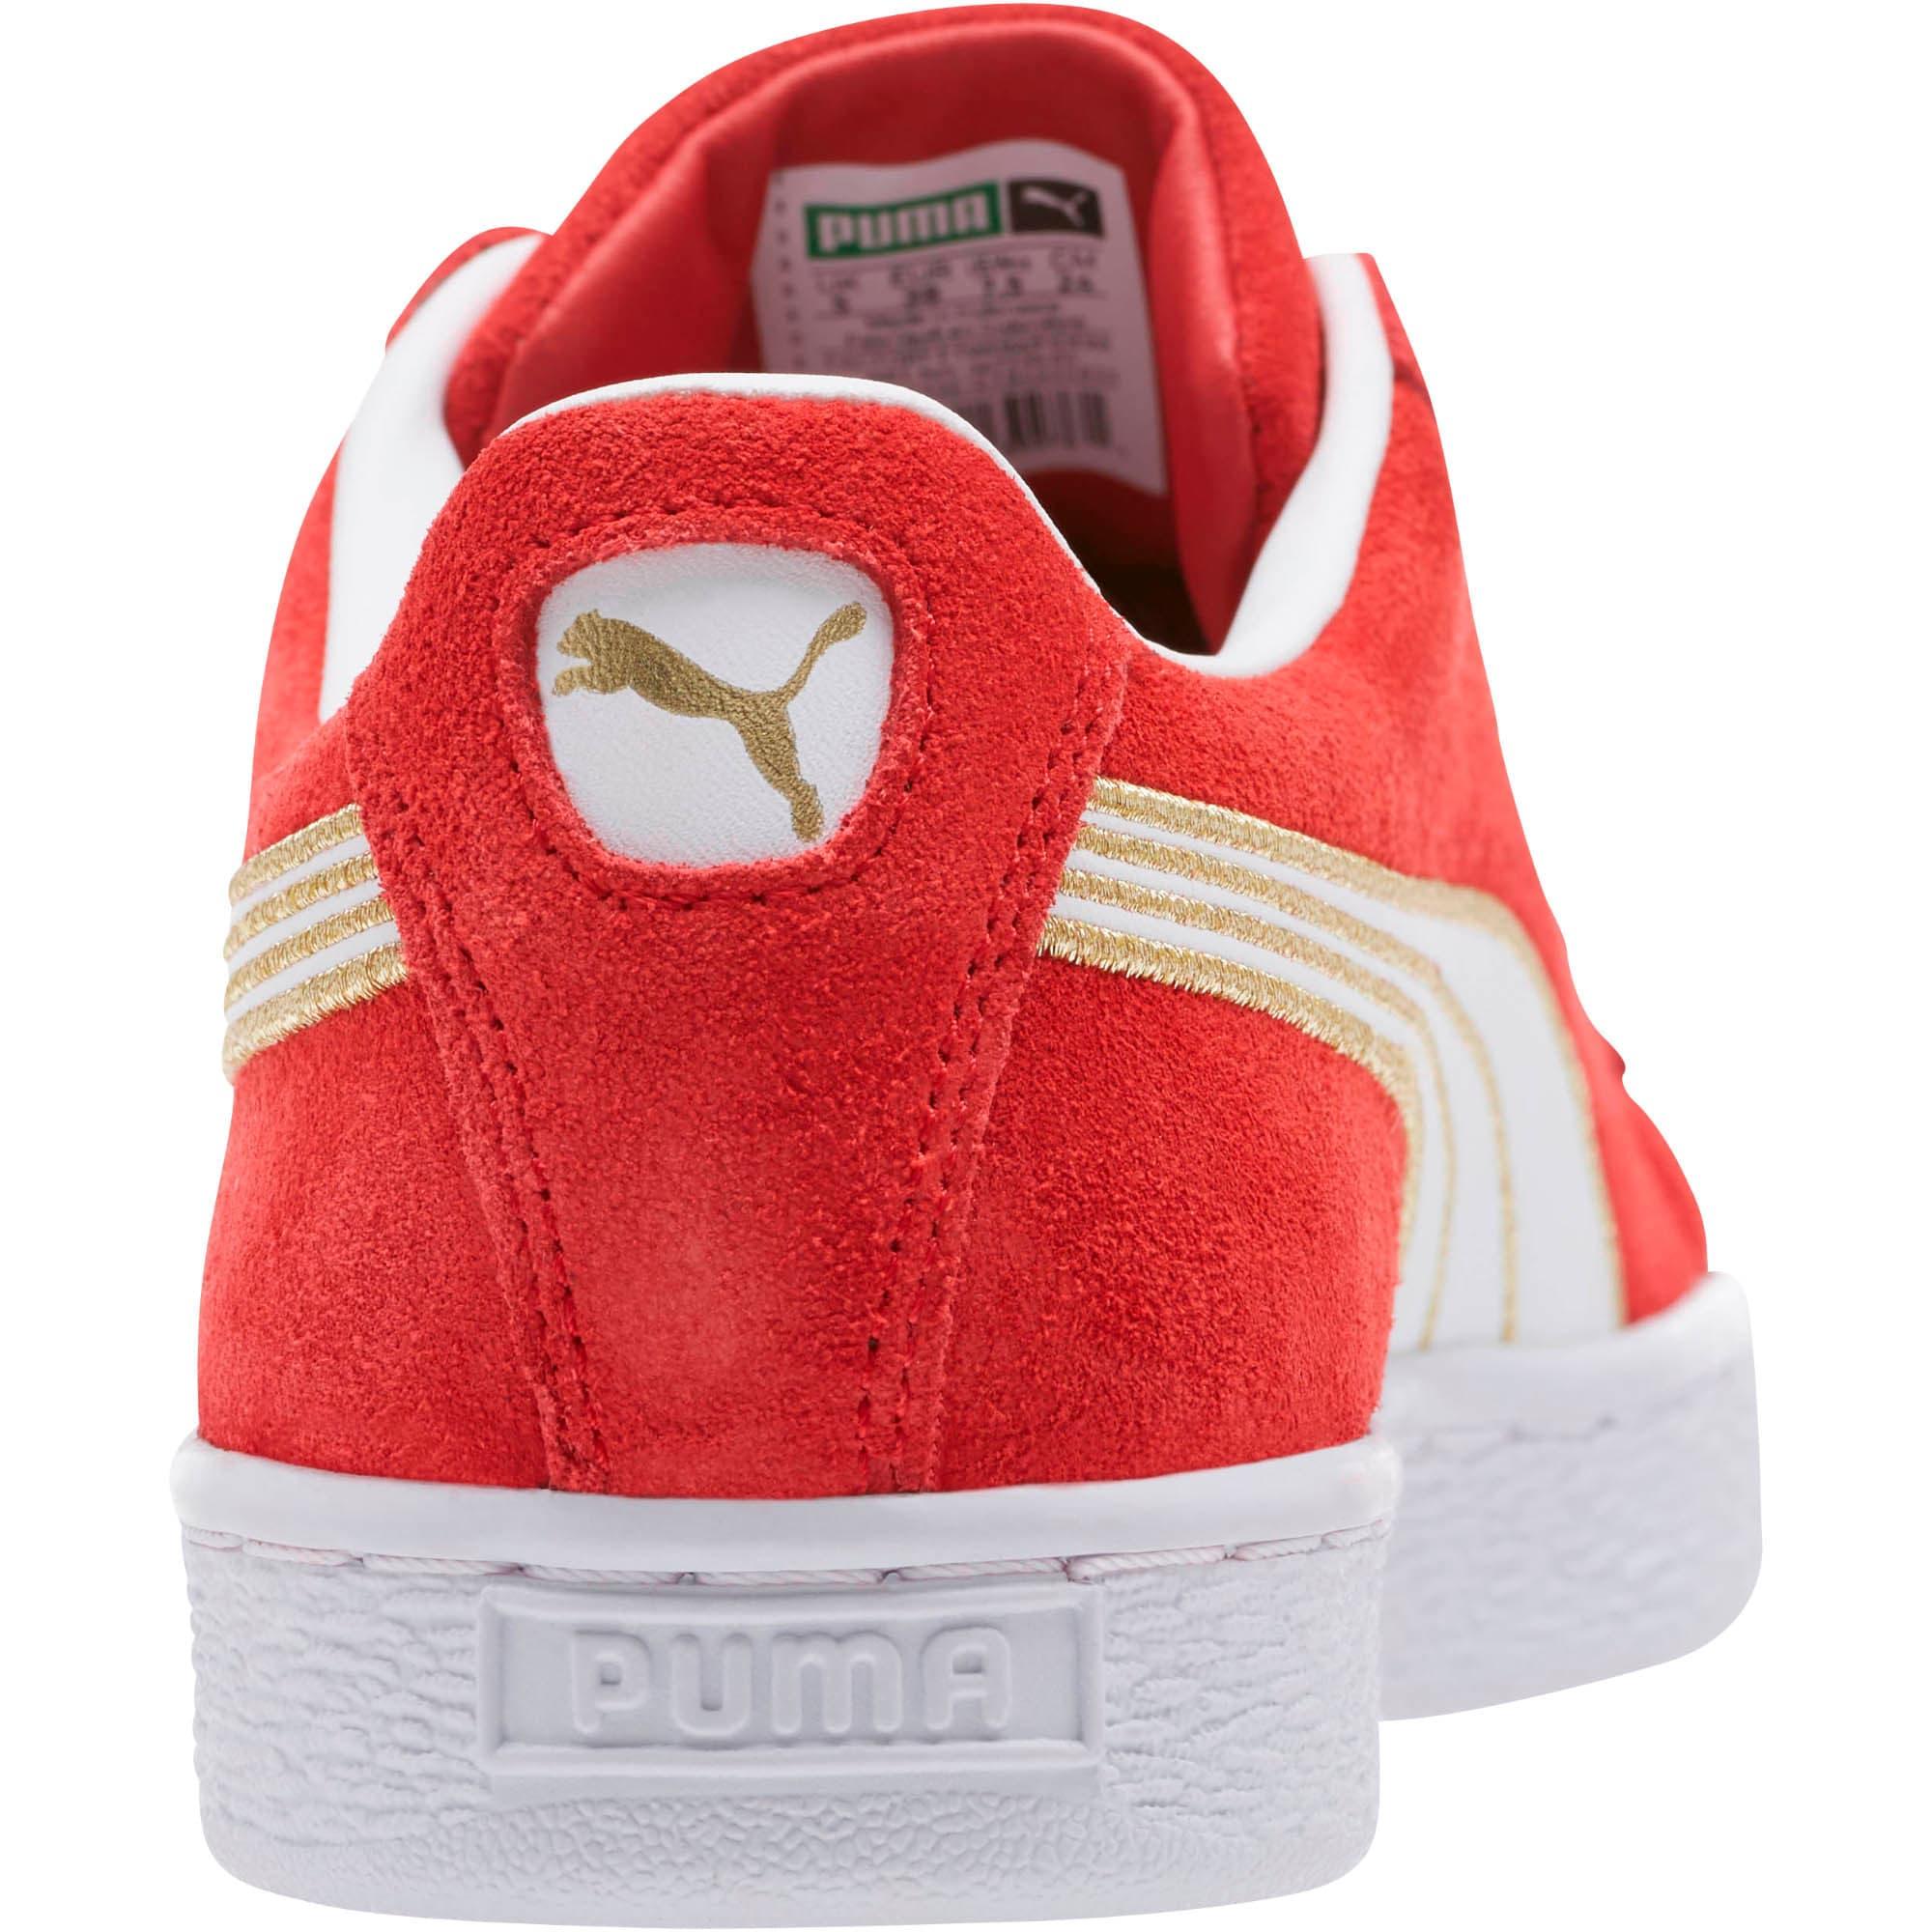 Thumbnail 4 of Suede Varsity Women's Sneakers, Ribbon Red-Puma White, medium